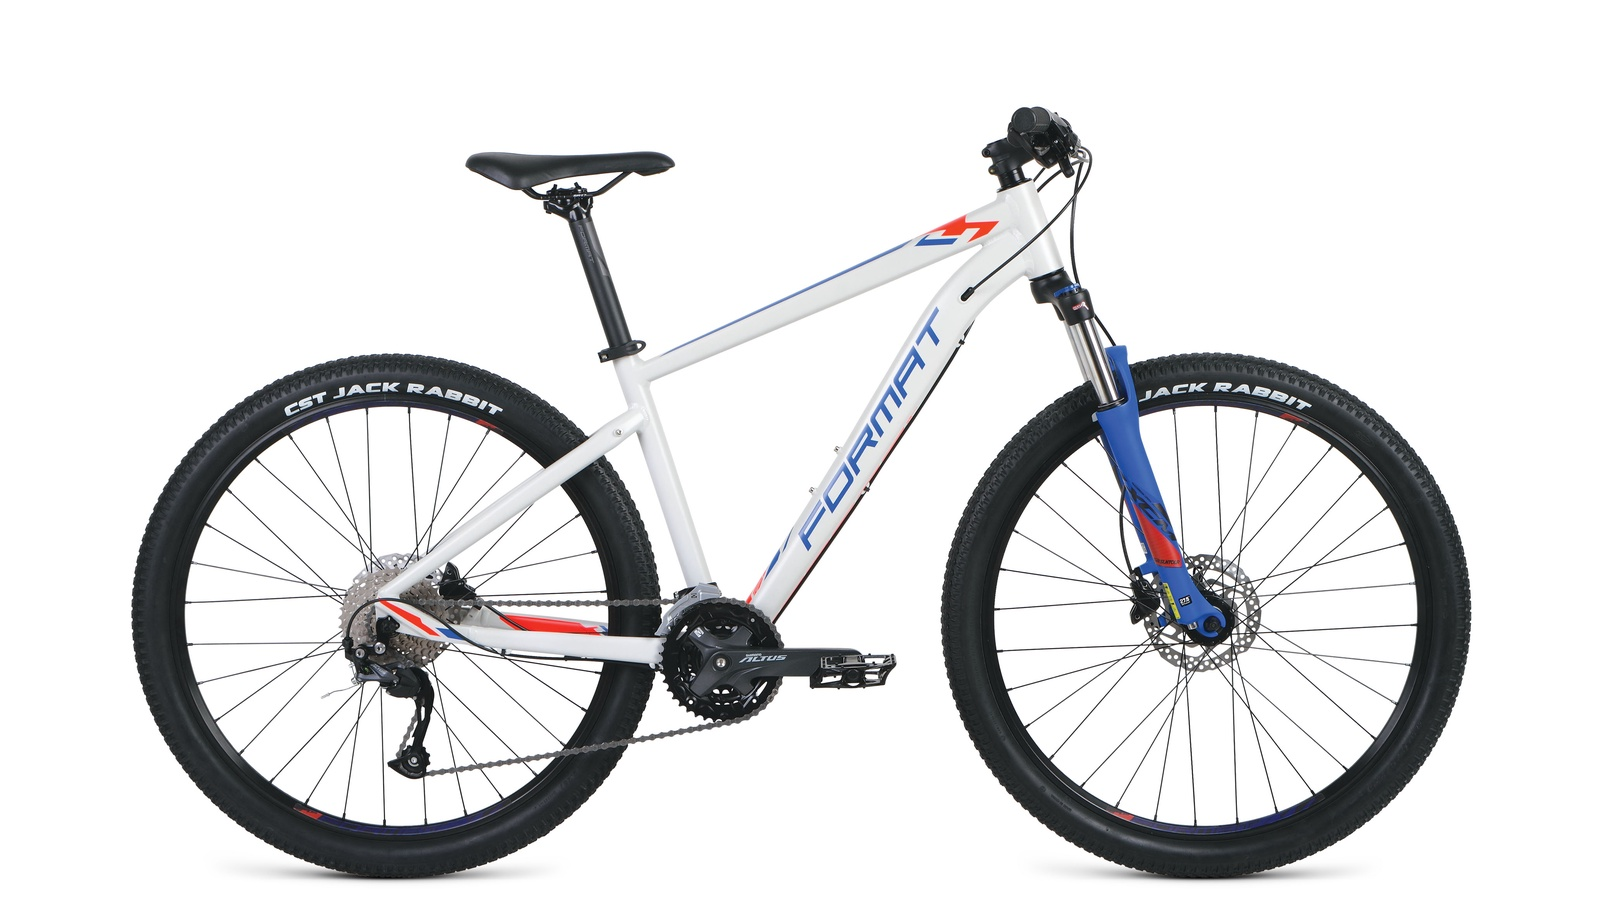 цена на Велосипед Format RBKM9M67S015, белый